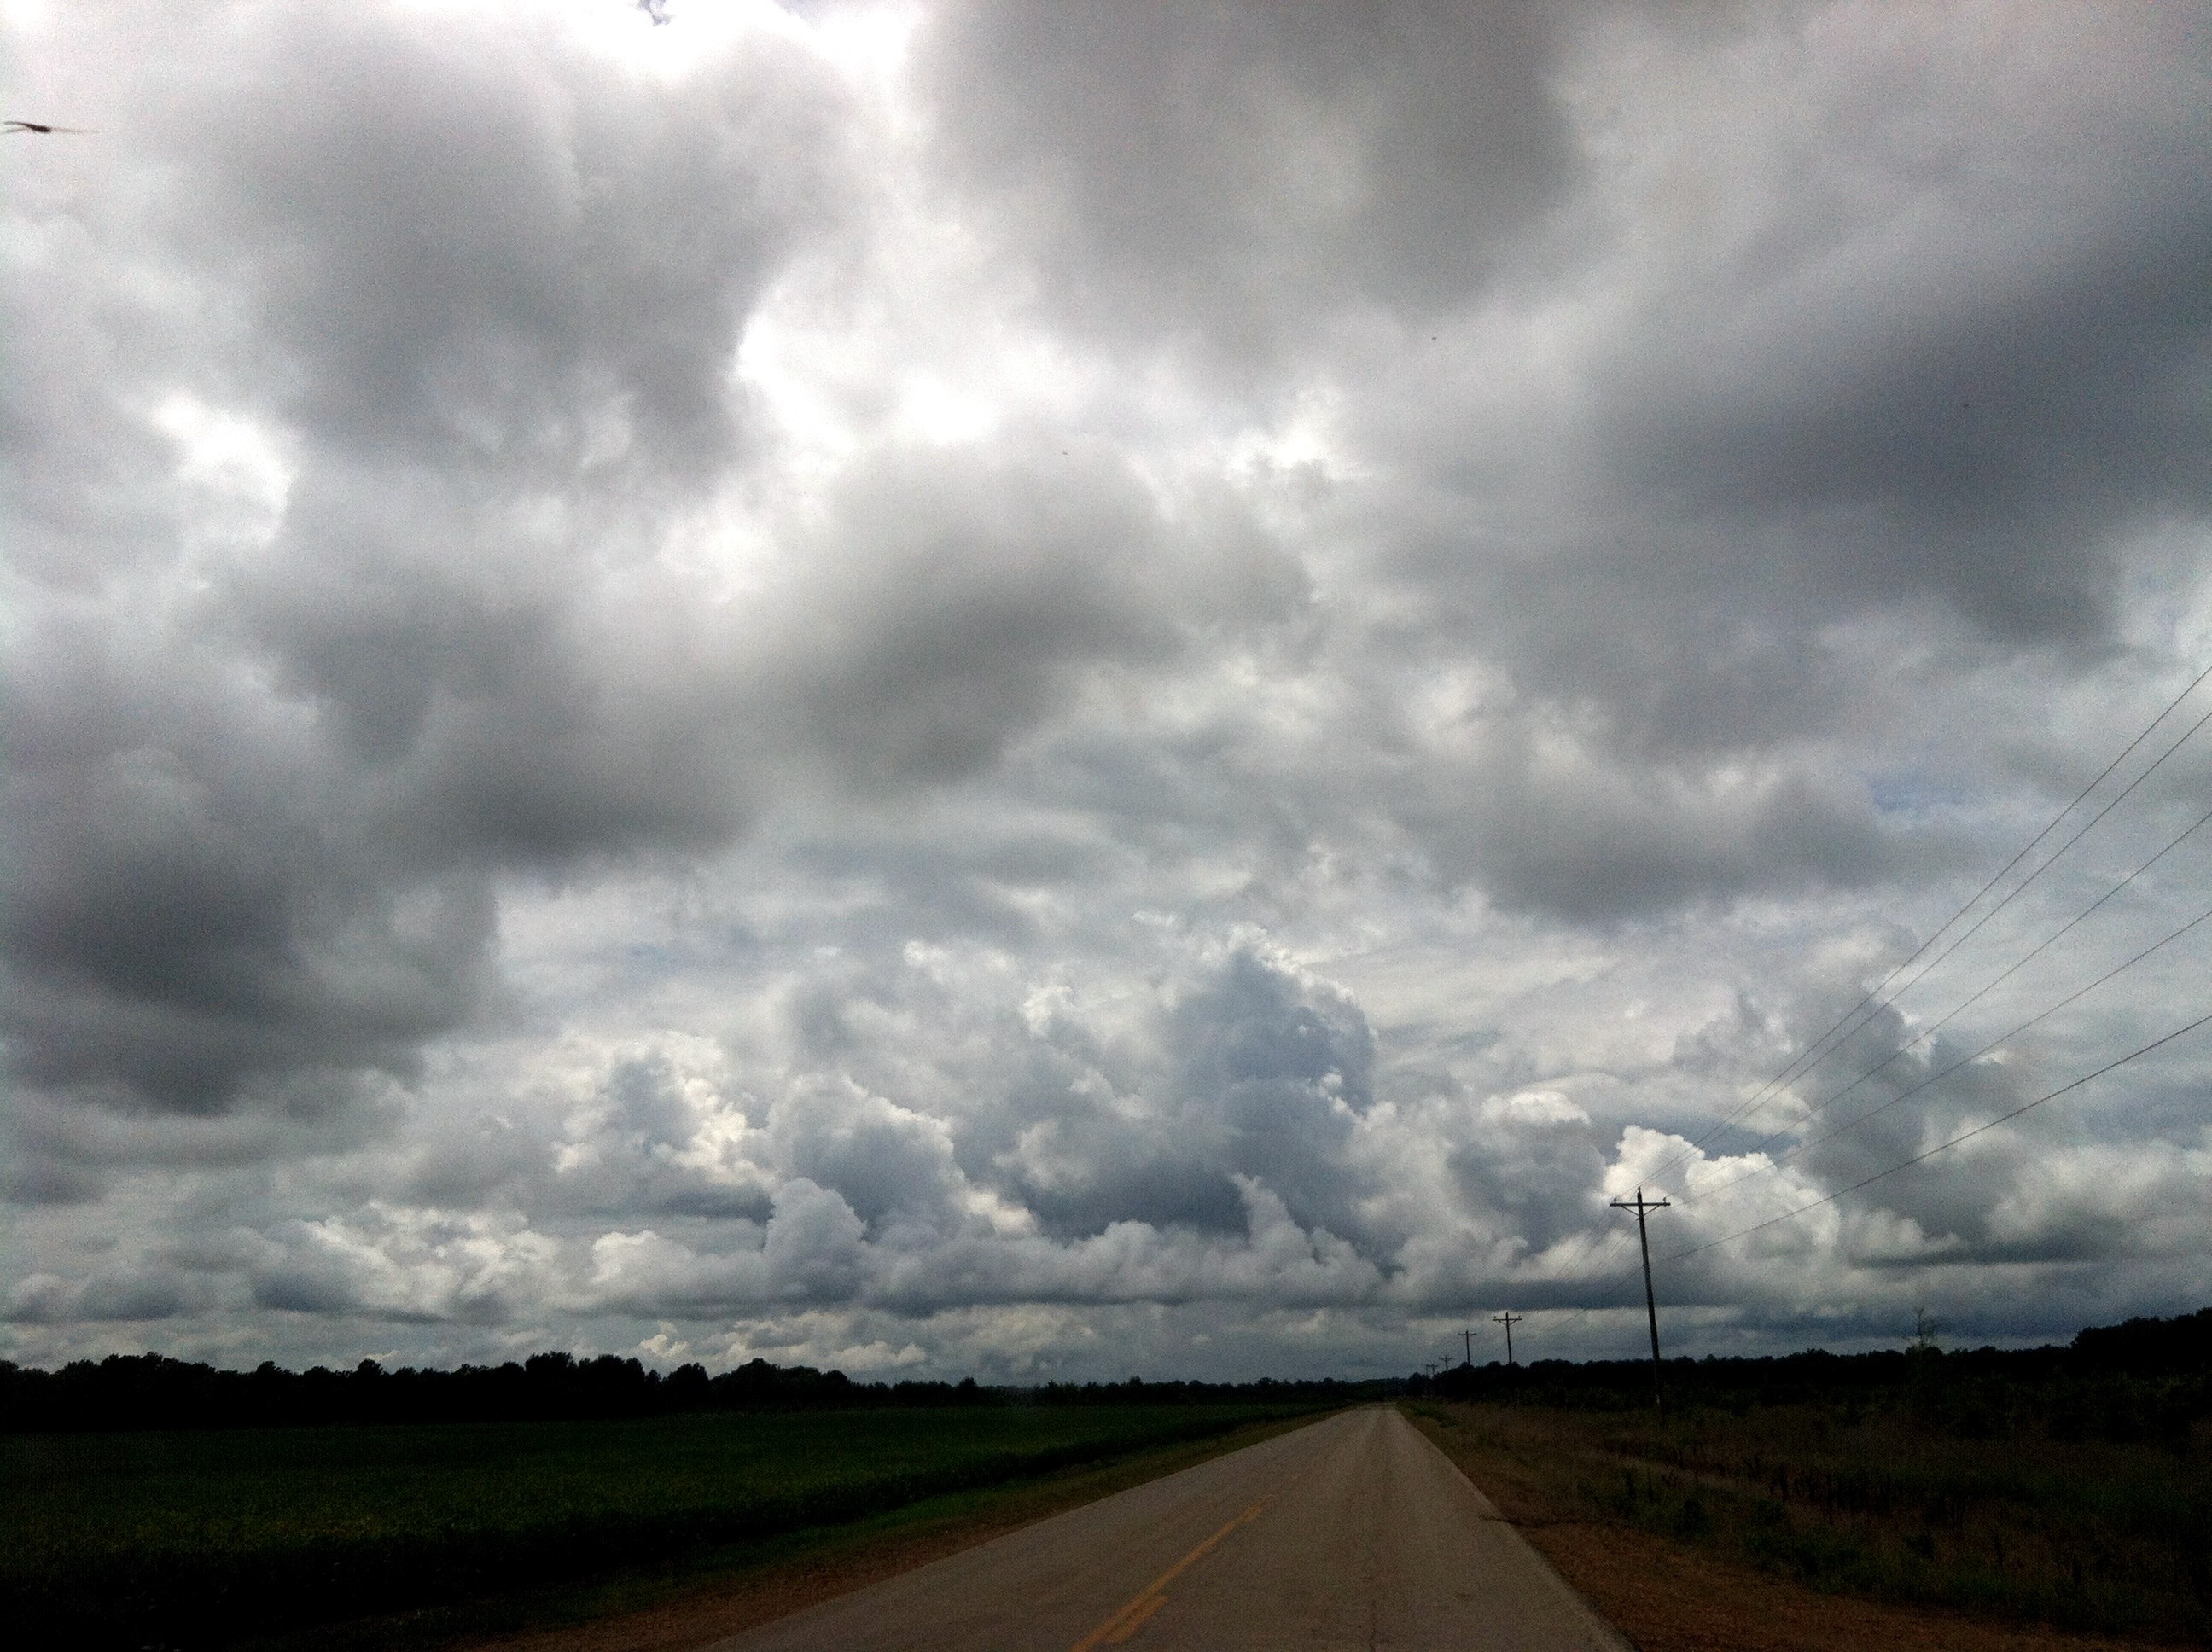 2012-08-03-threateningclouds.JPG